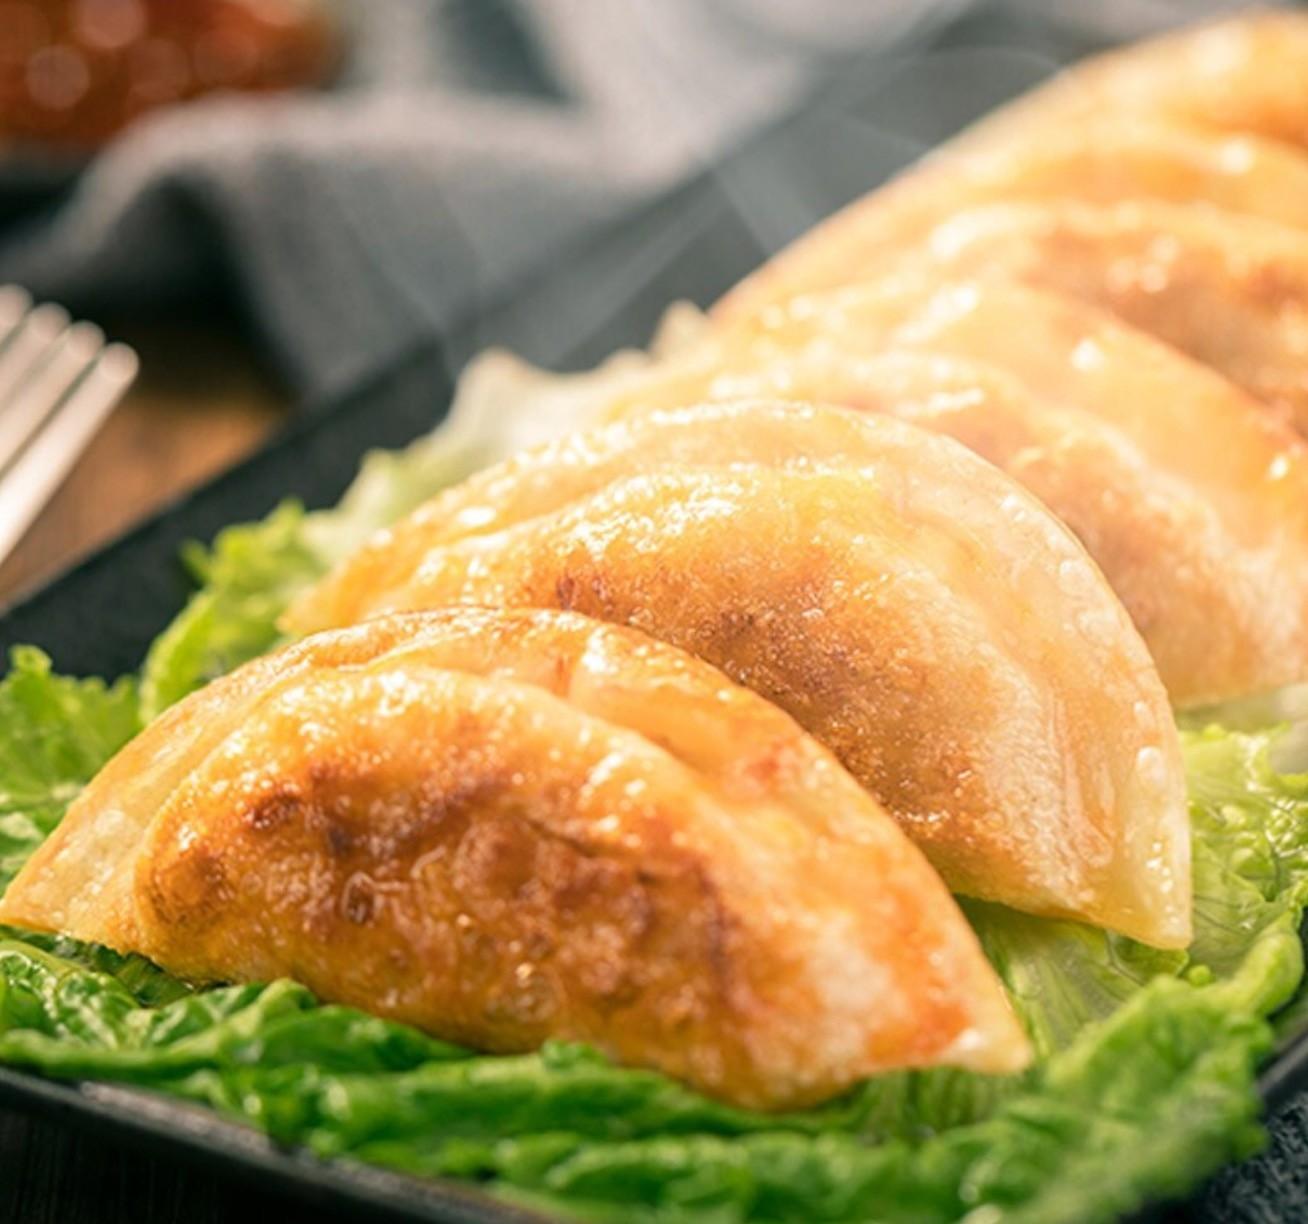 bibigo  必品阁  煎饺速冻水饺  250g*8包